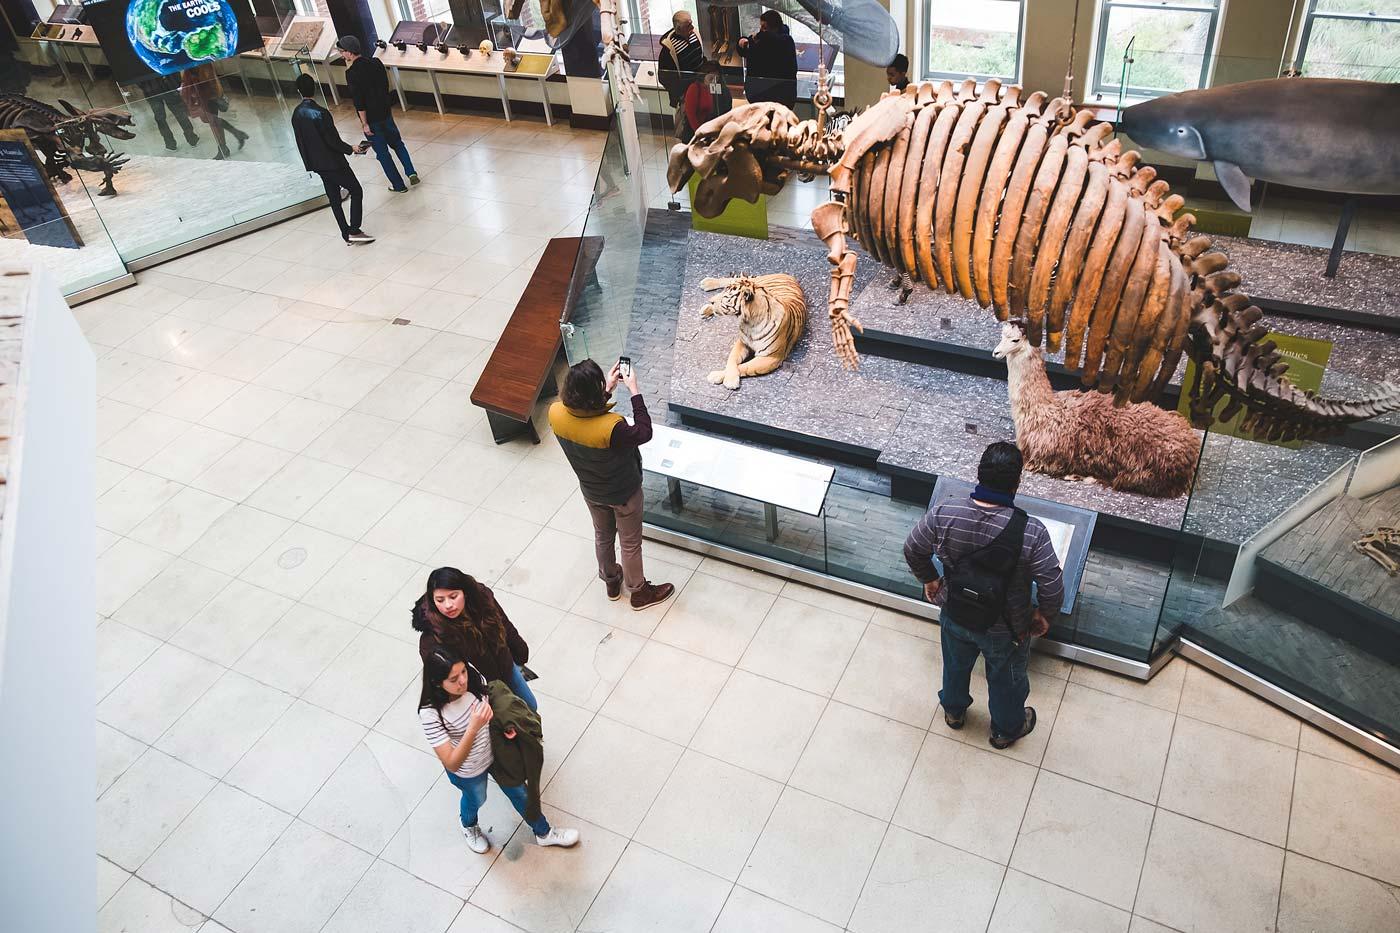 sNatural-History-Museum---Feb-2017-103.jpg